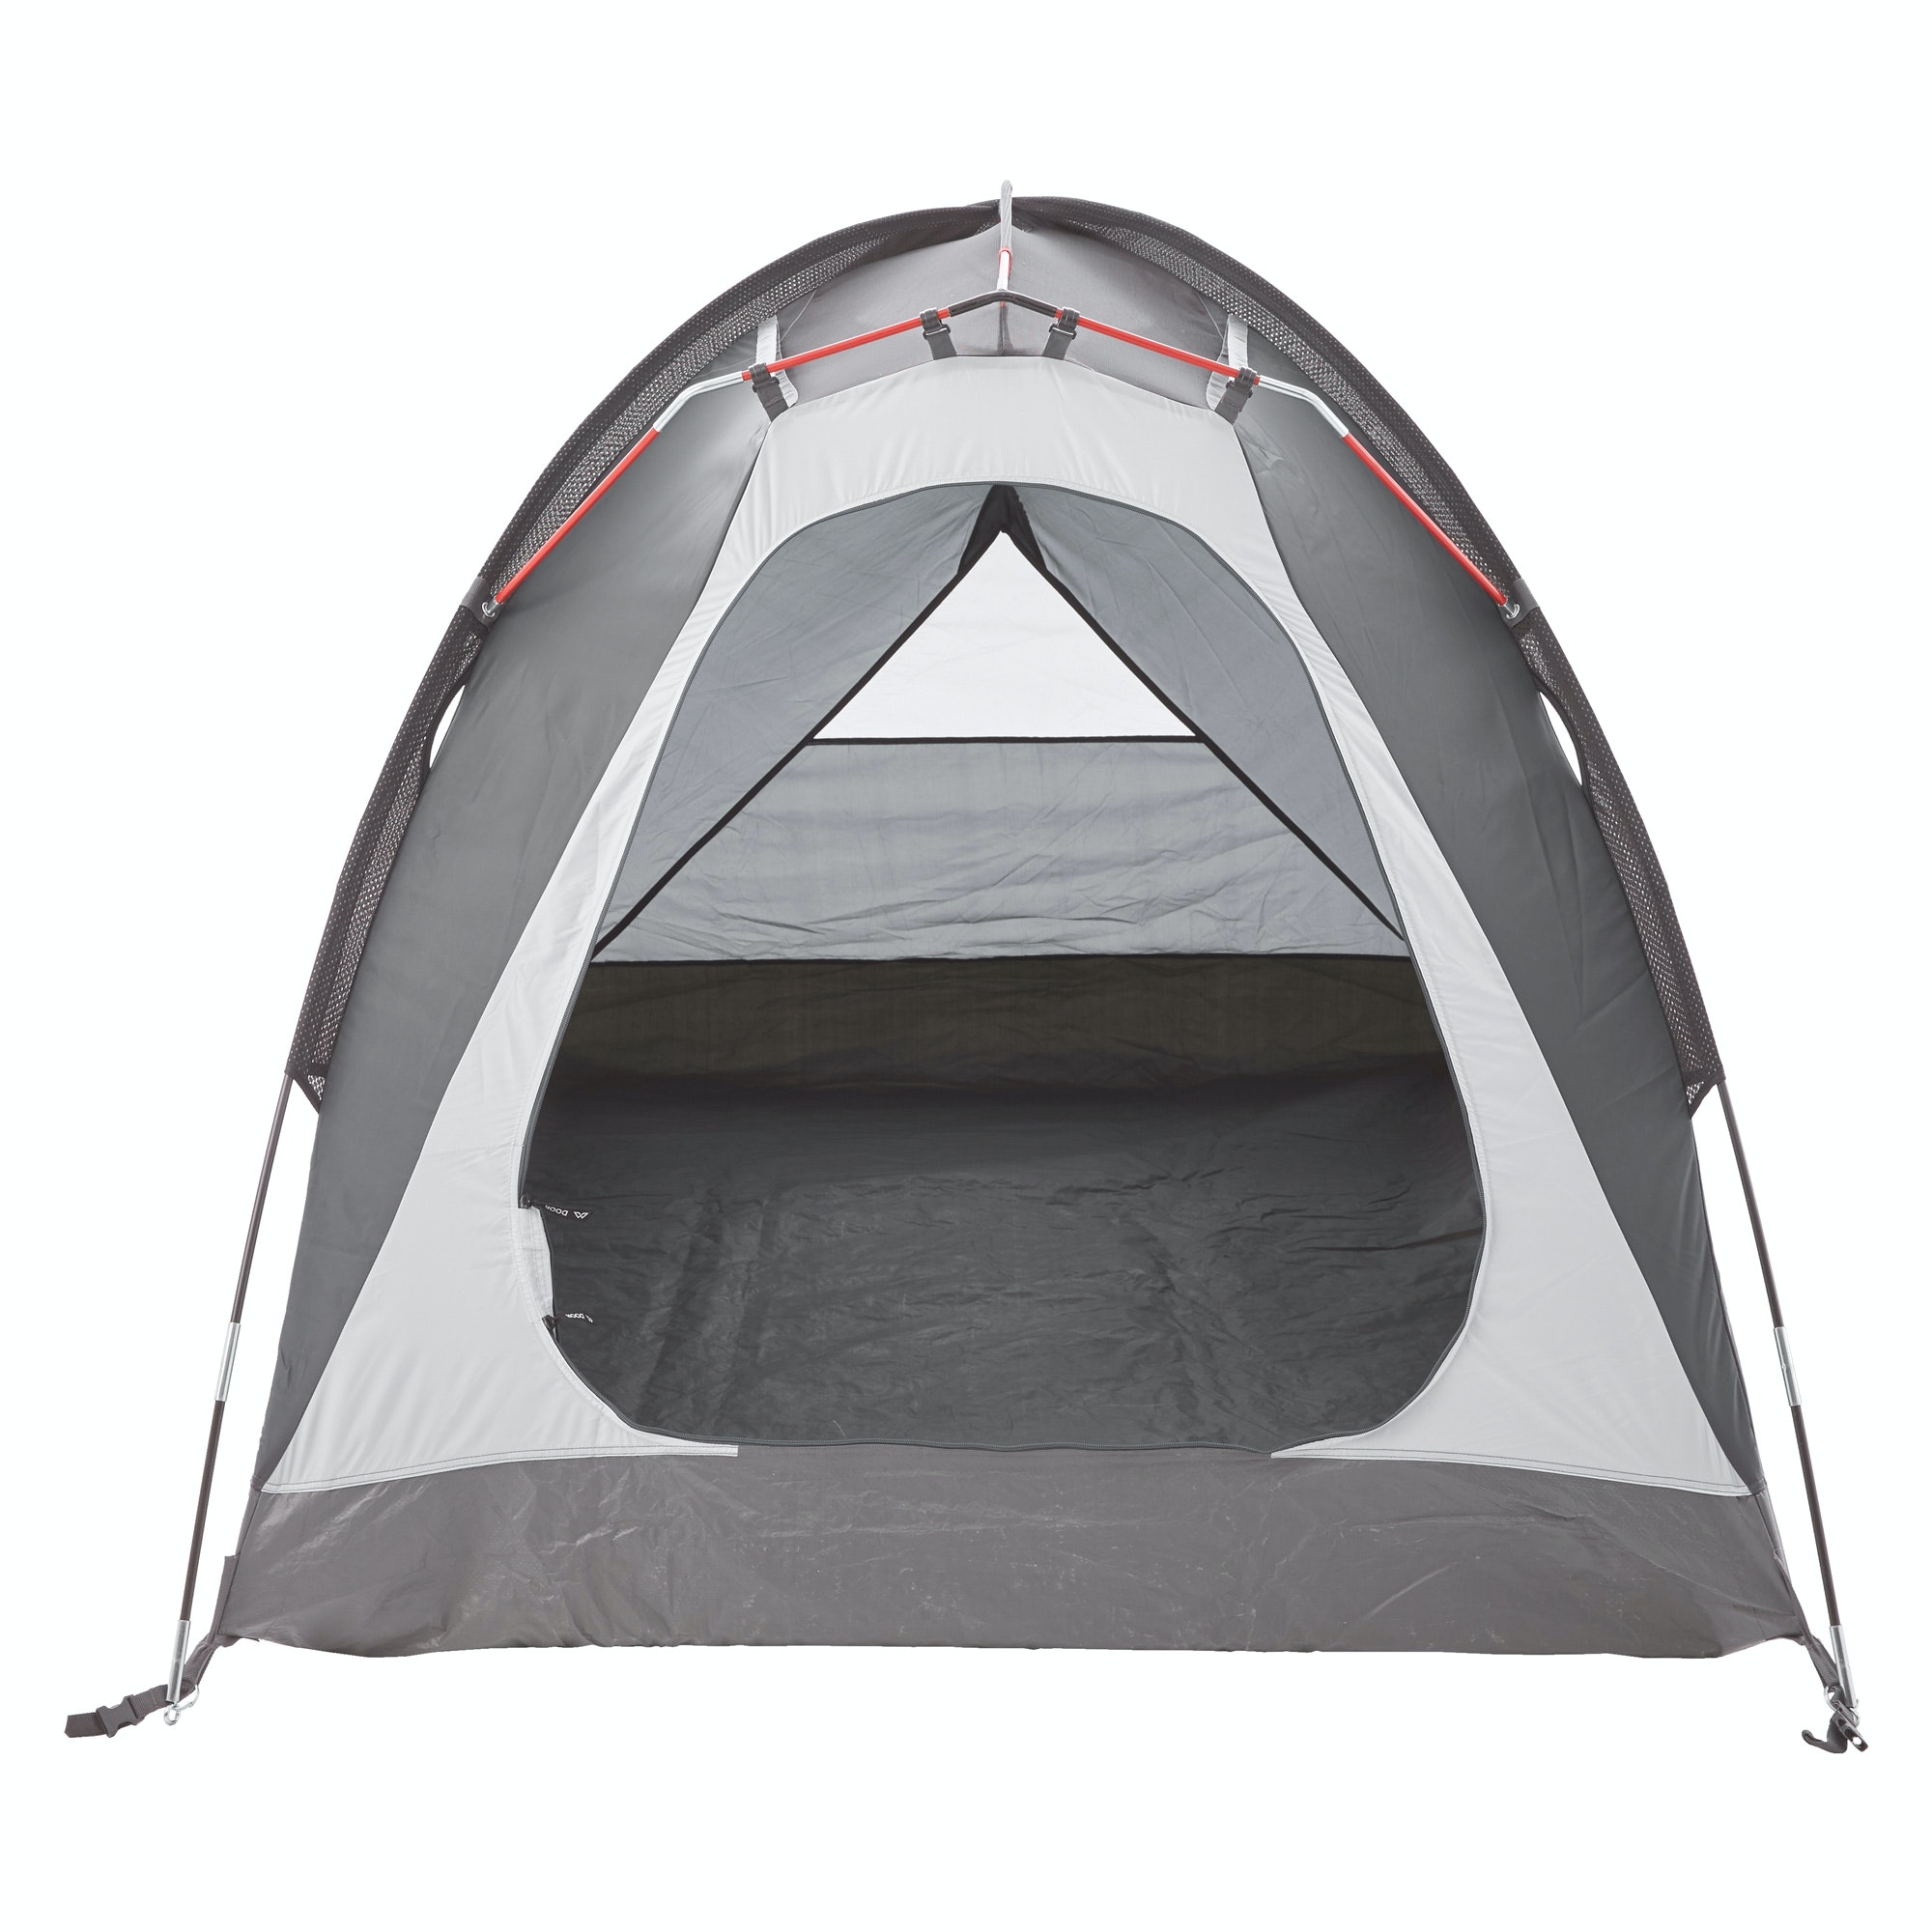 NEW-Kathmandu-Retreat-40-2-Person-Waterproof-Compact-Camping-Hiking-Tent thumbnail 5